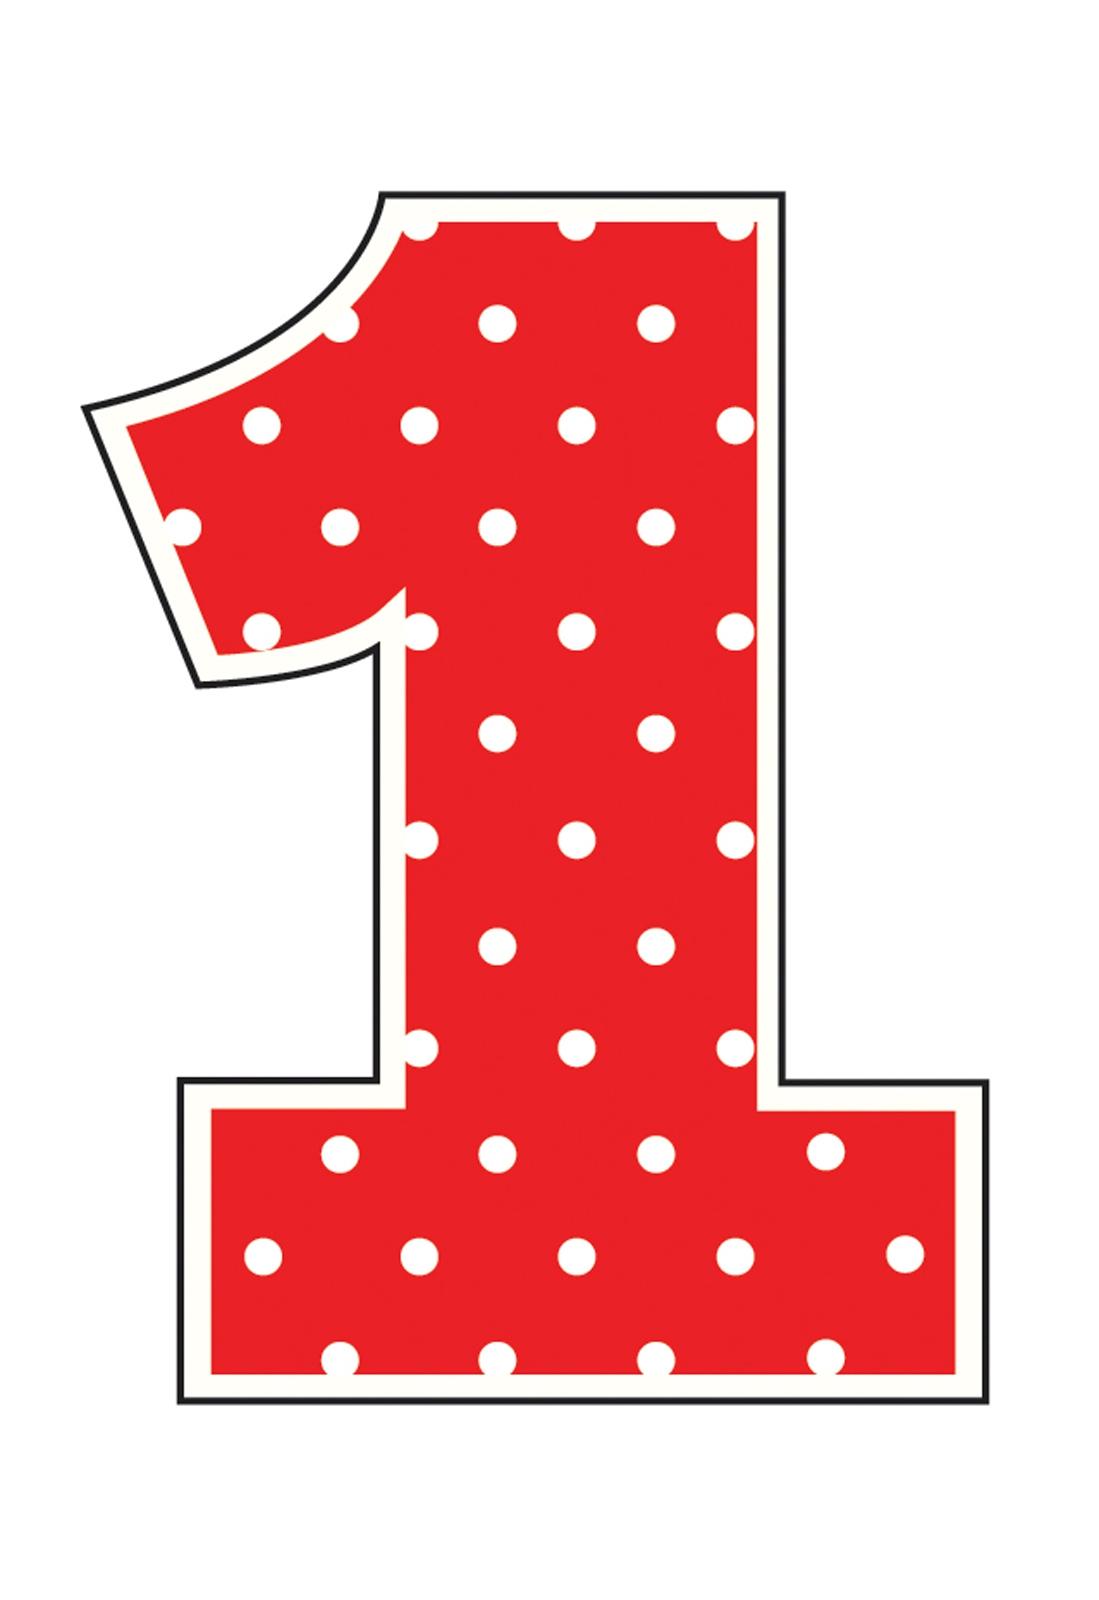 Polka Dot Number 3 Clipart#2060649.